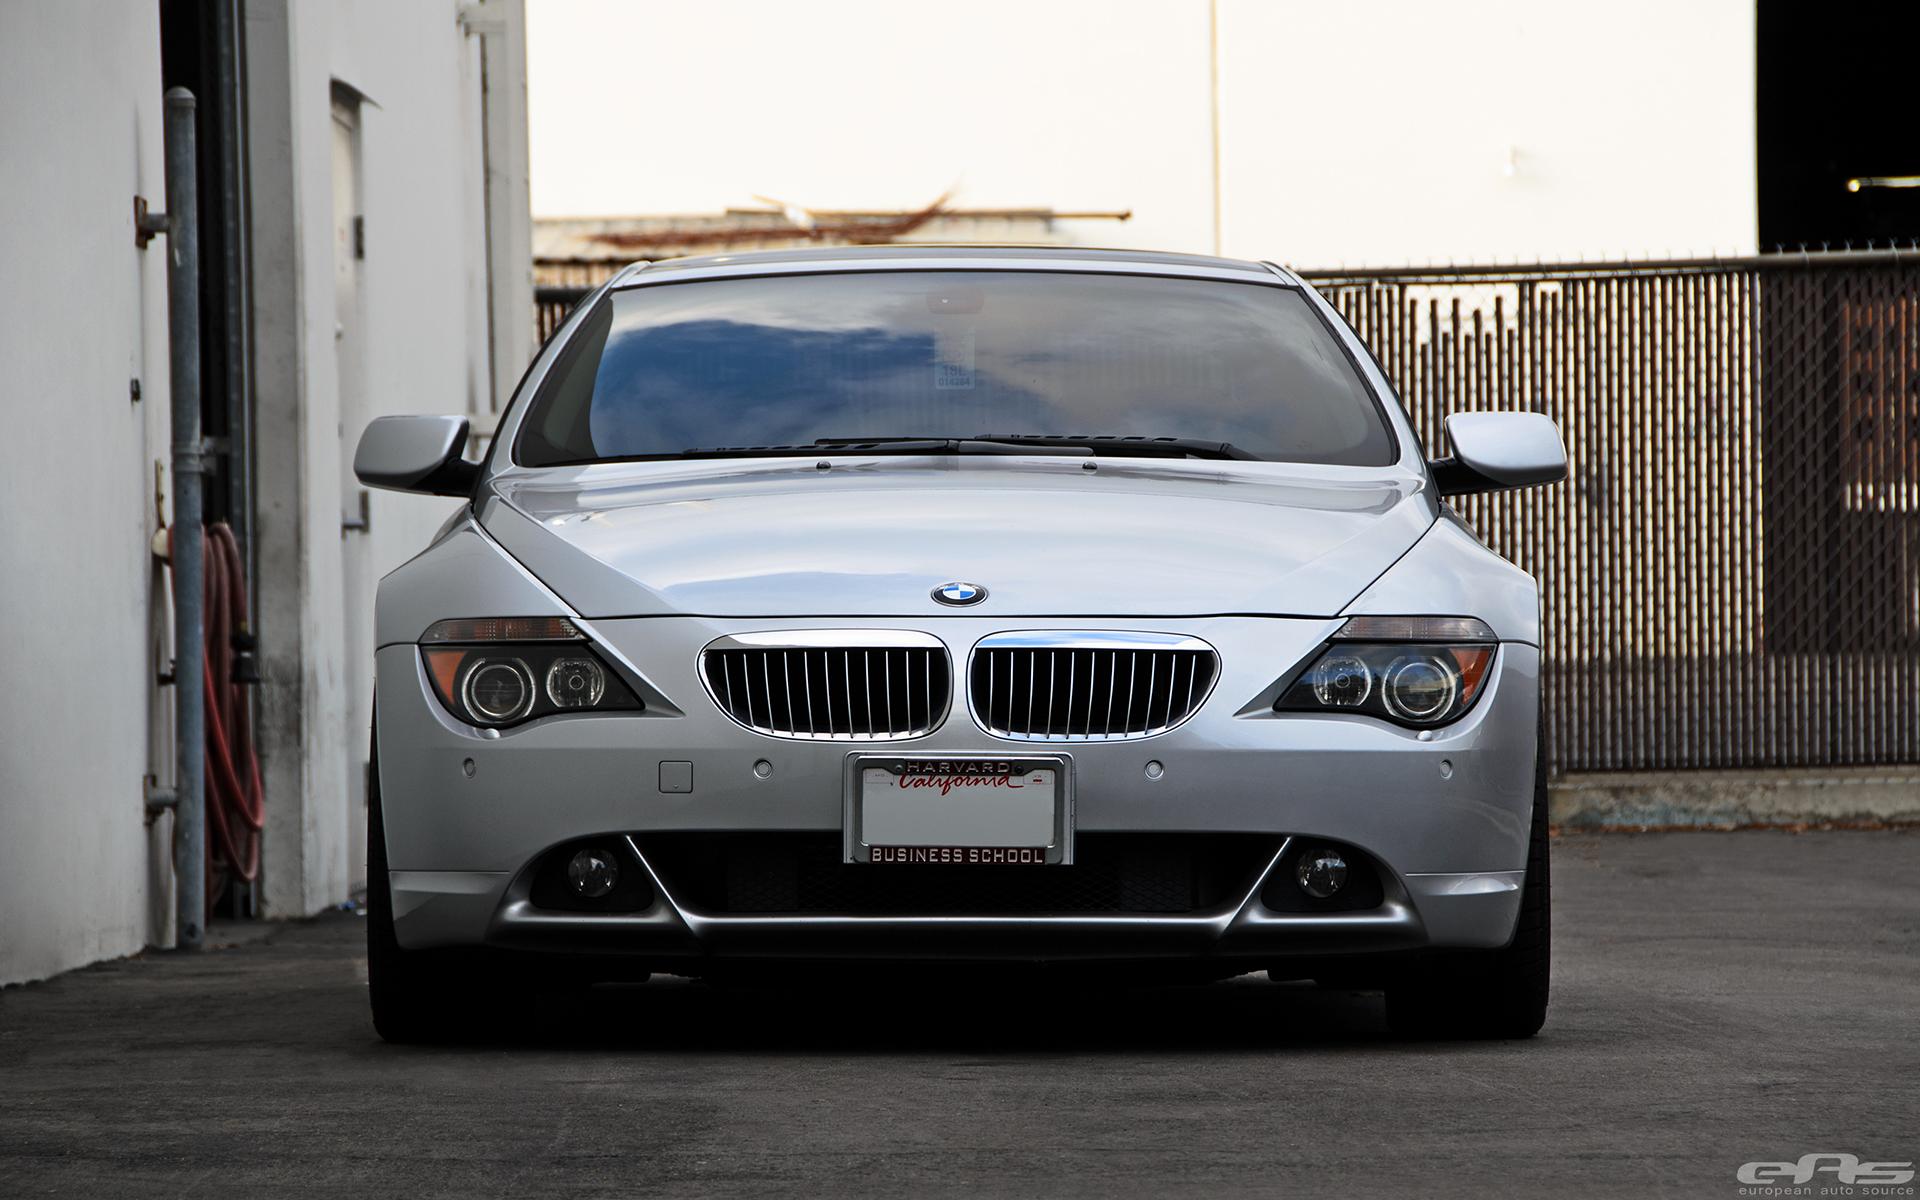 Titanium Silver BMW 645Ci Image 5